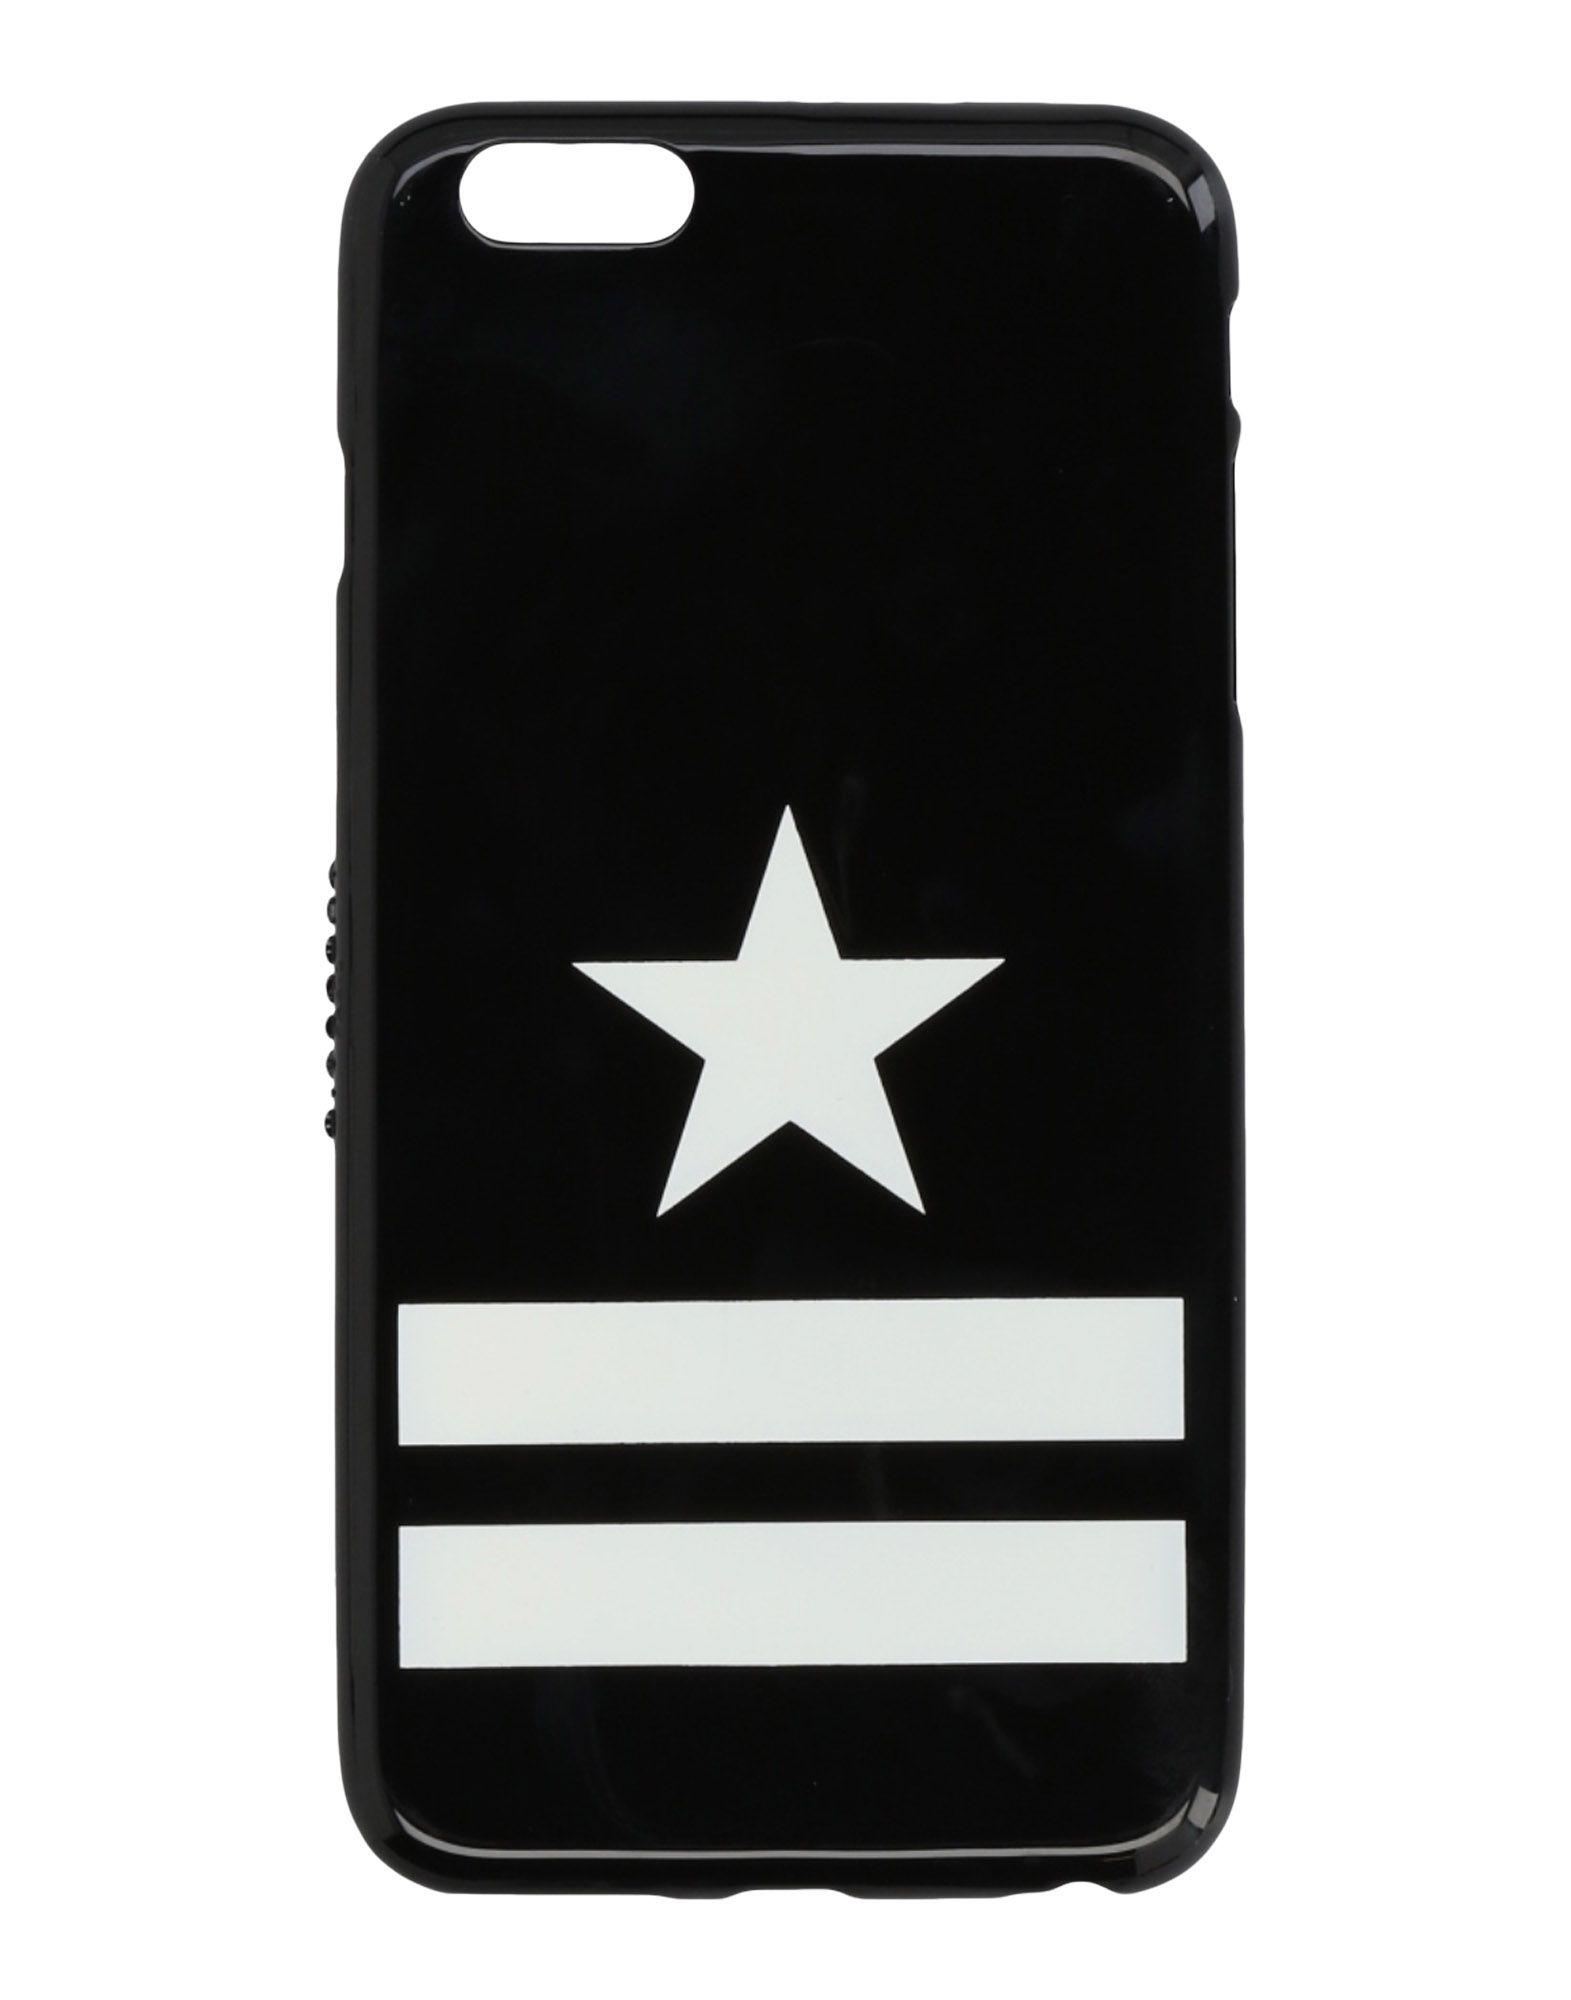 Фото - GIVENCHY Чехол чехол pitaka magcase pro противоударный для iphone xs max черно серый